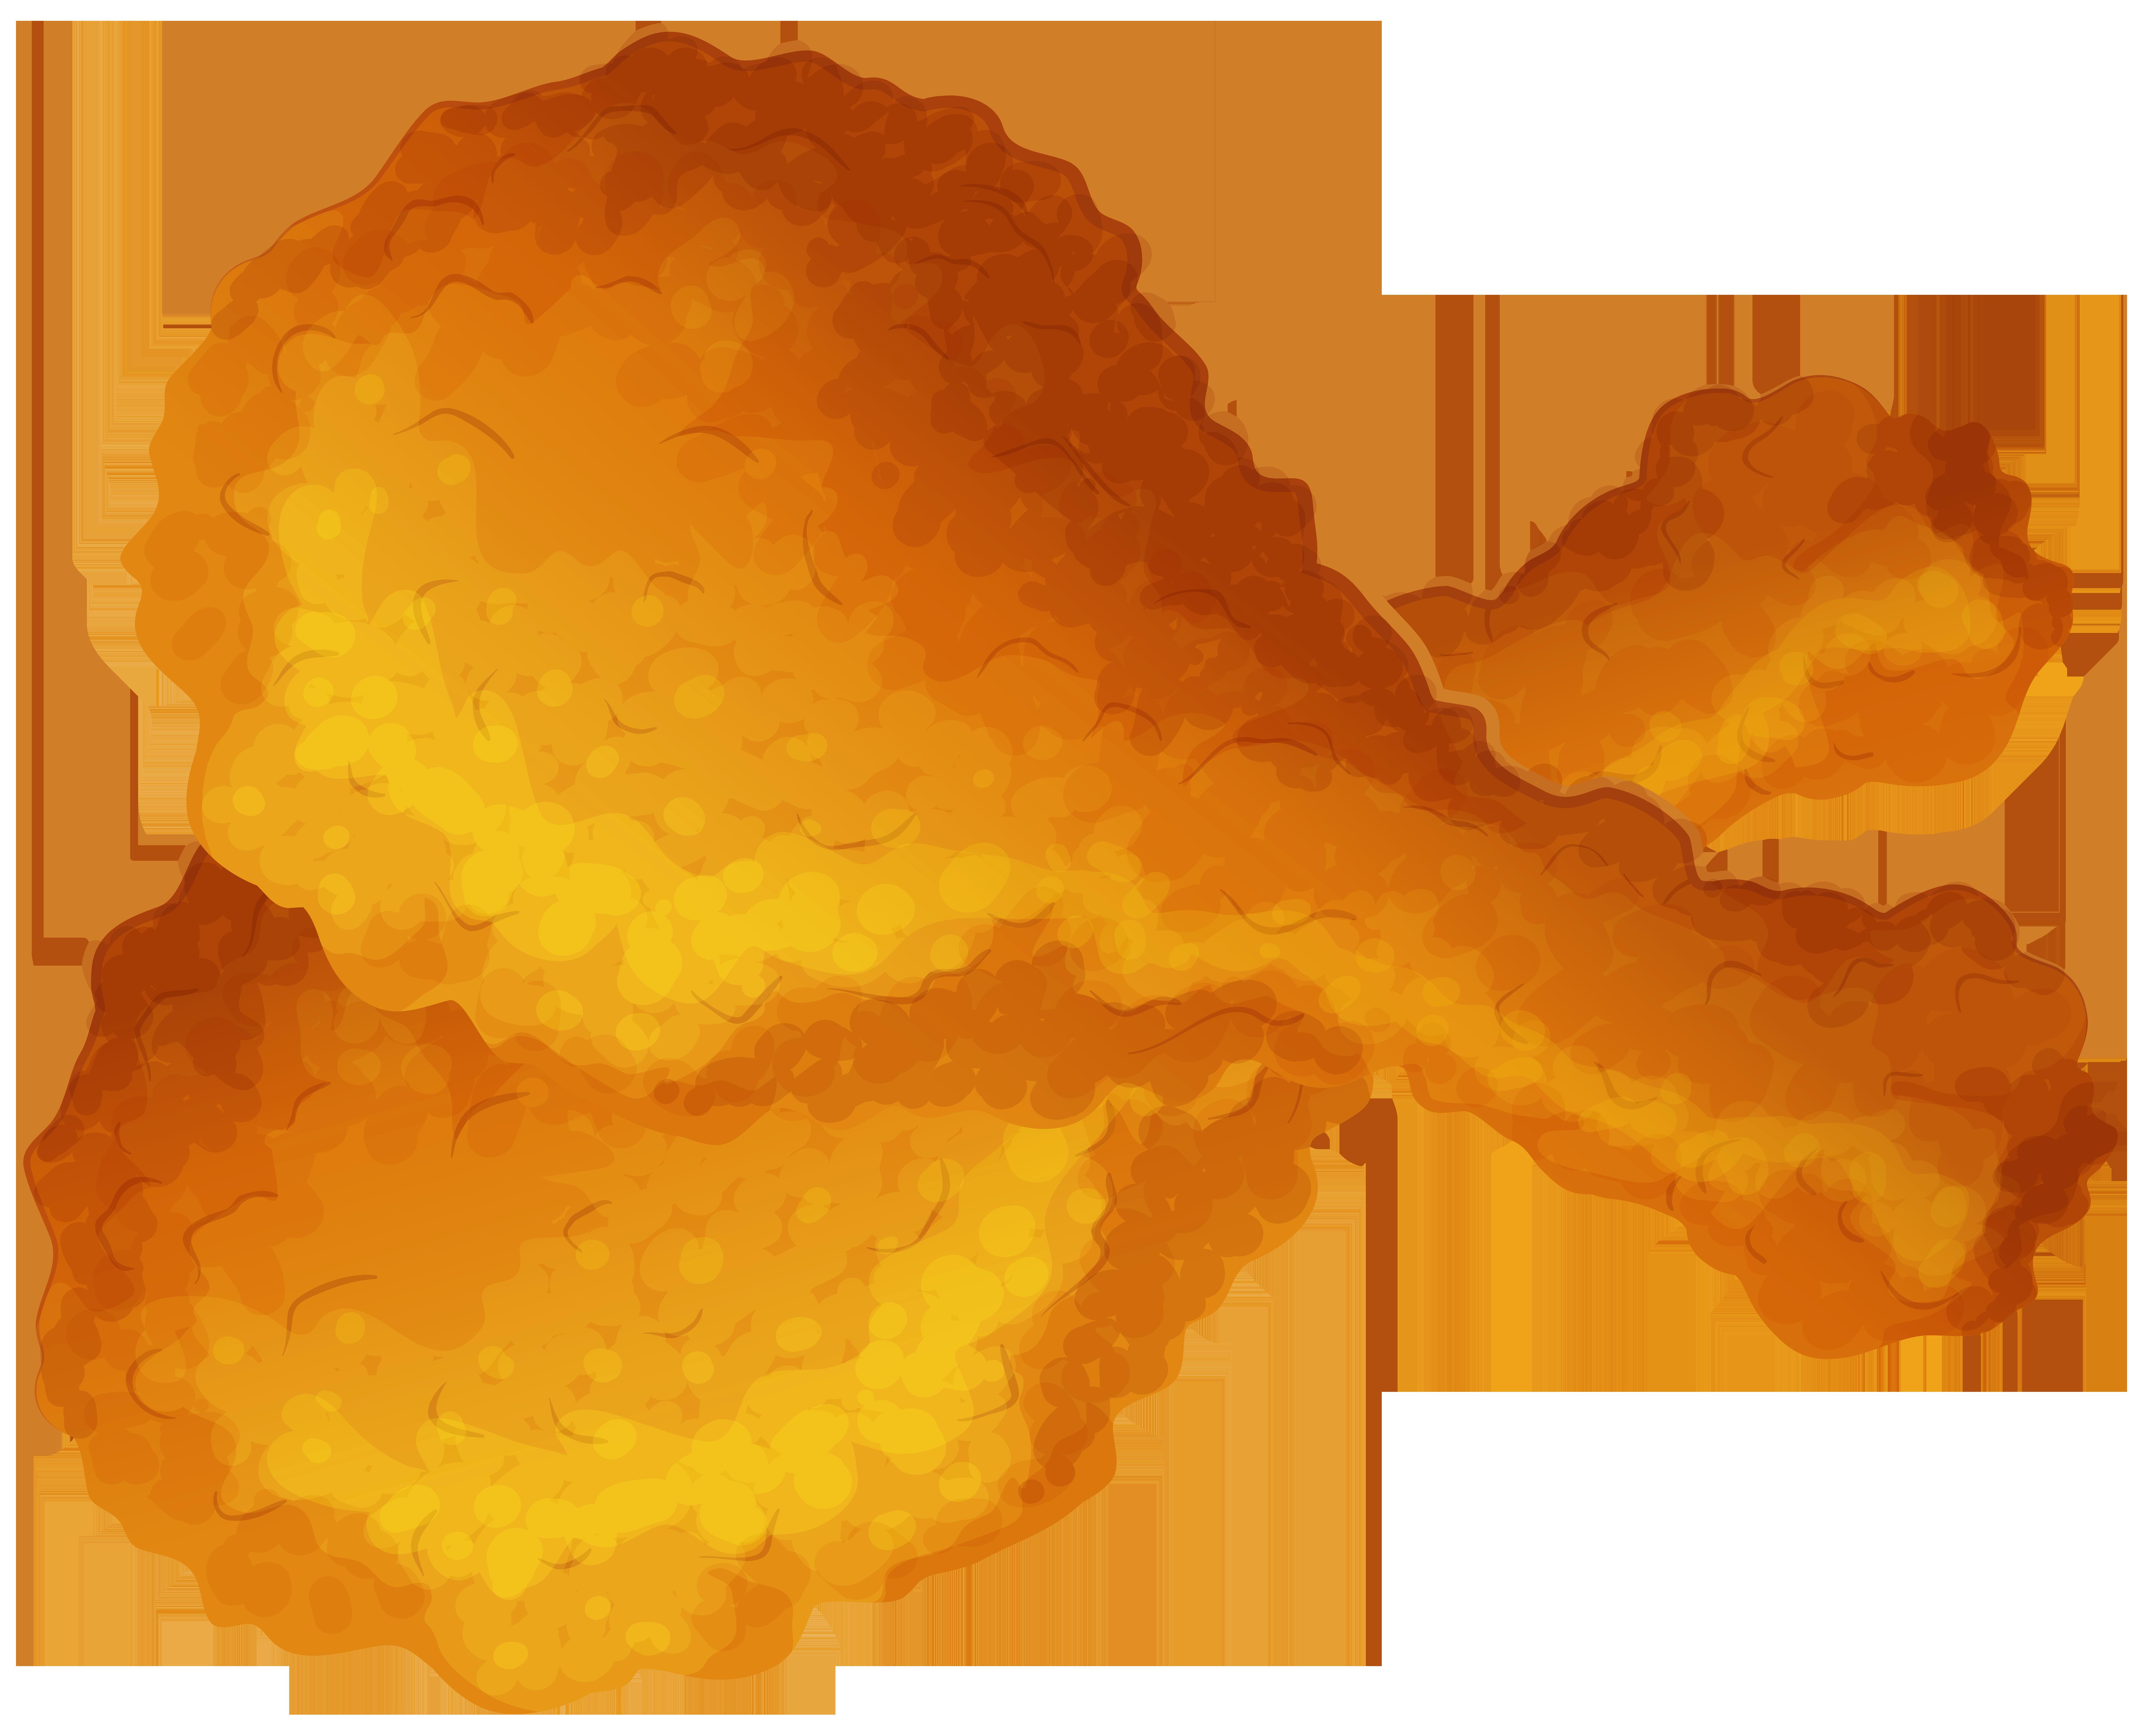 Fried Chicken Legs Transparent PNG Clip Art Image.